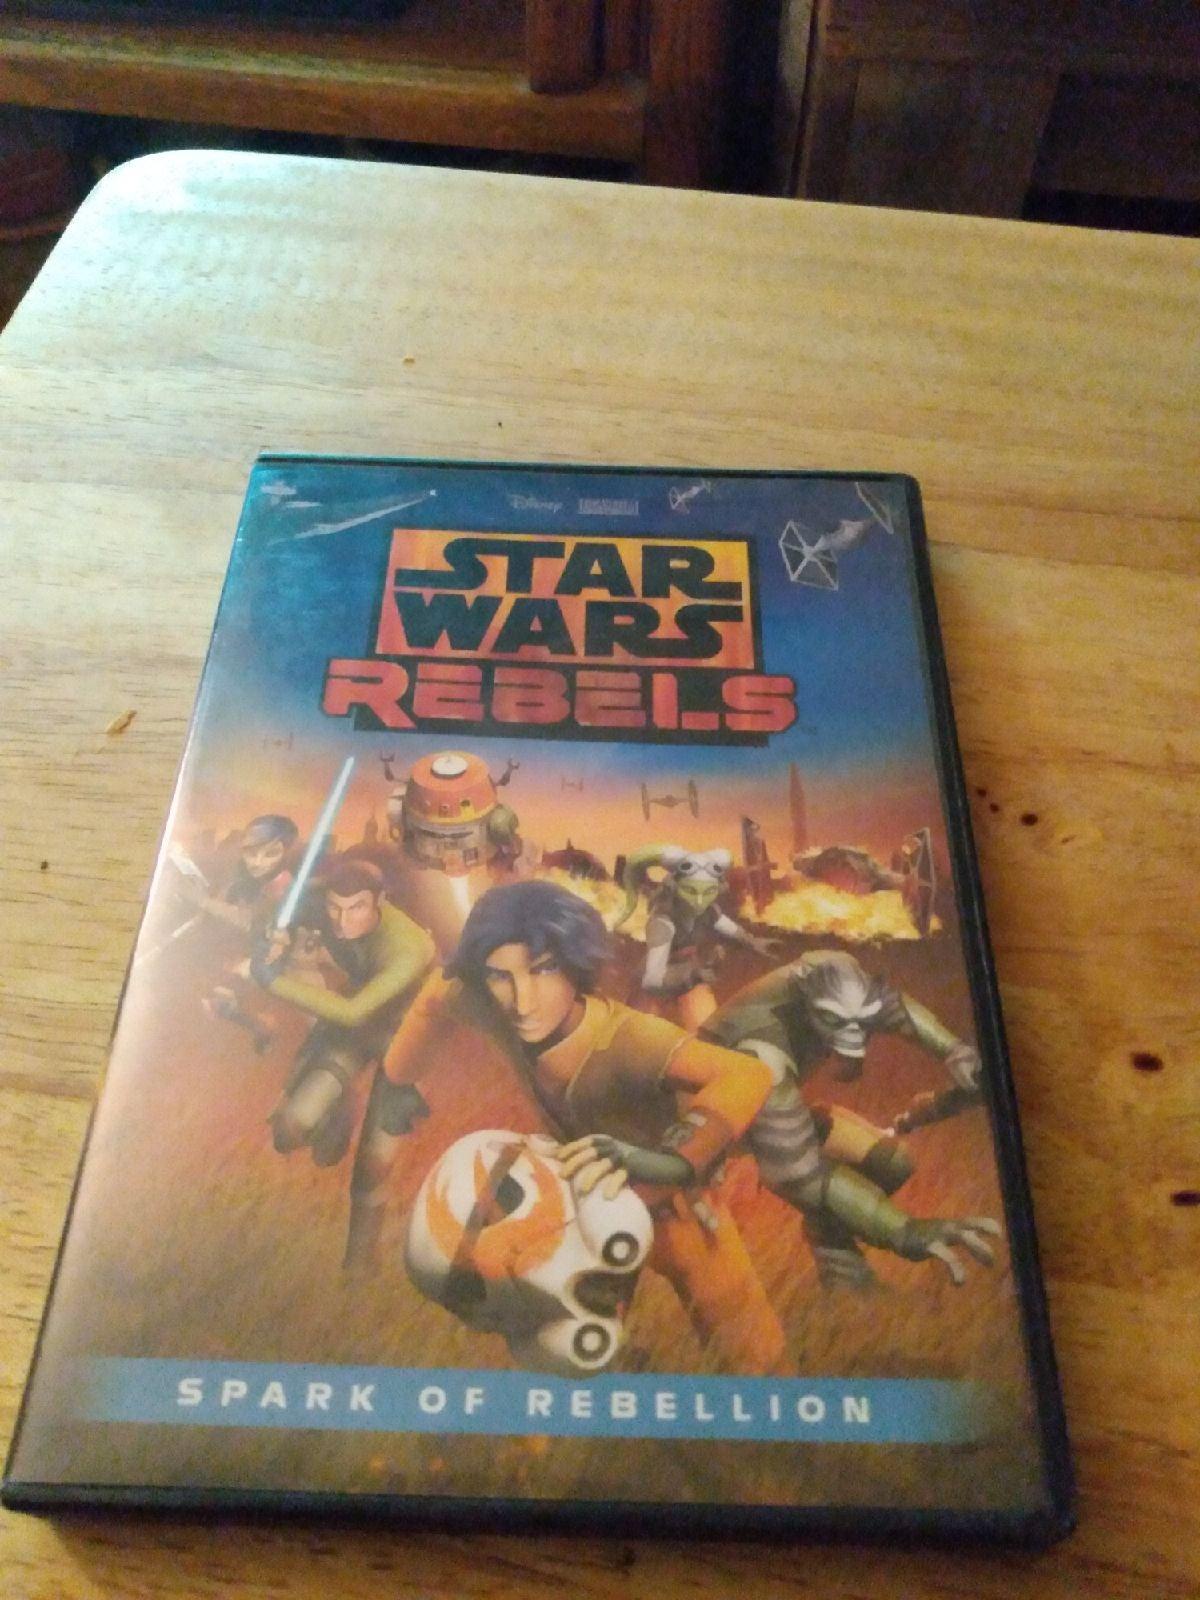 STAR WARS REBELS Spark Of Rebellion(DVD)